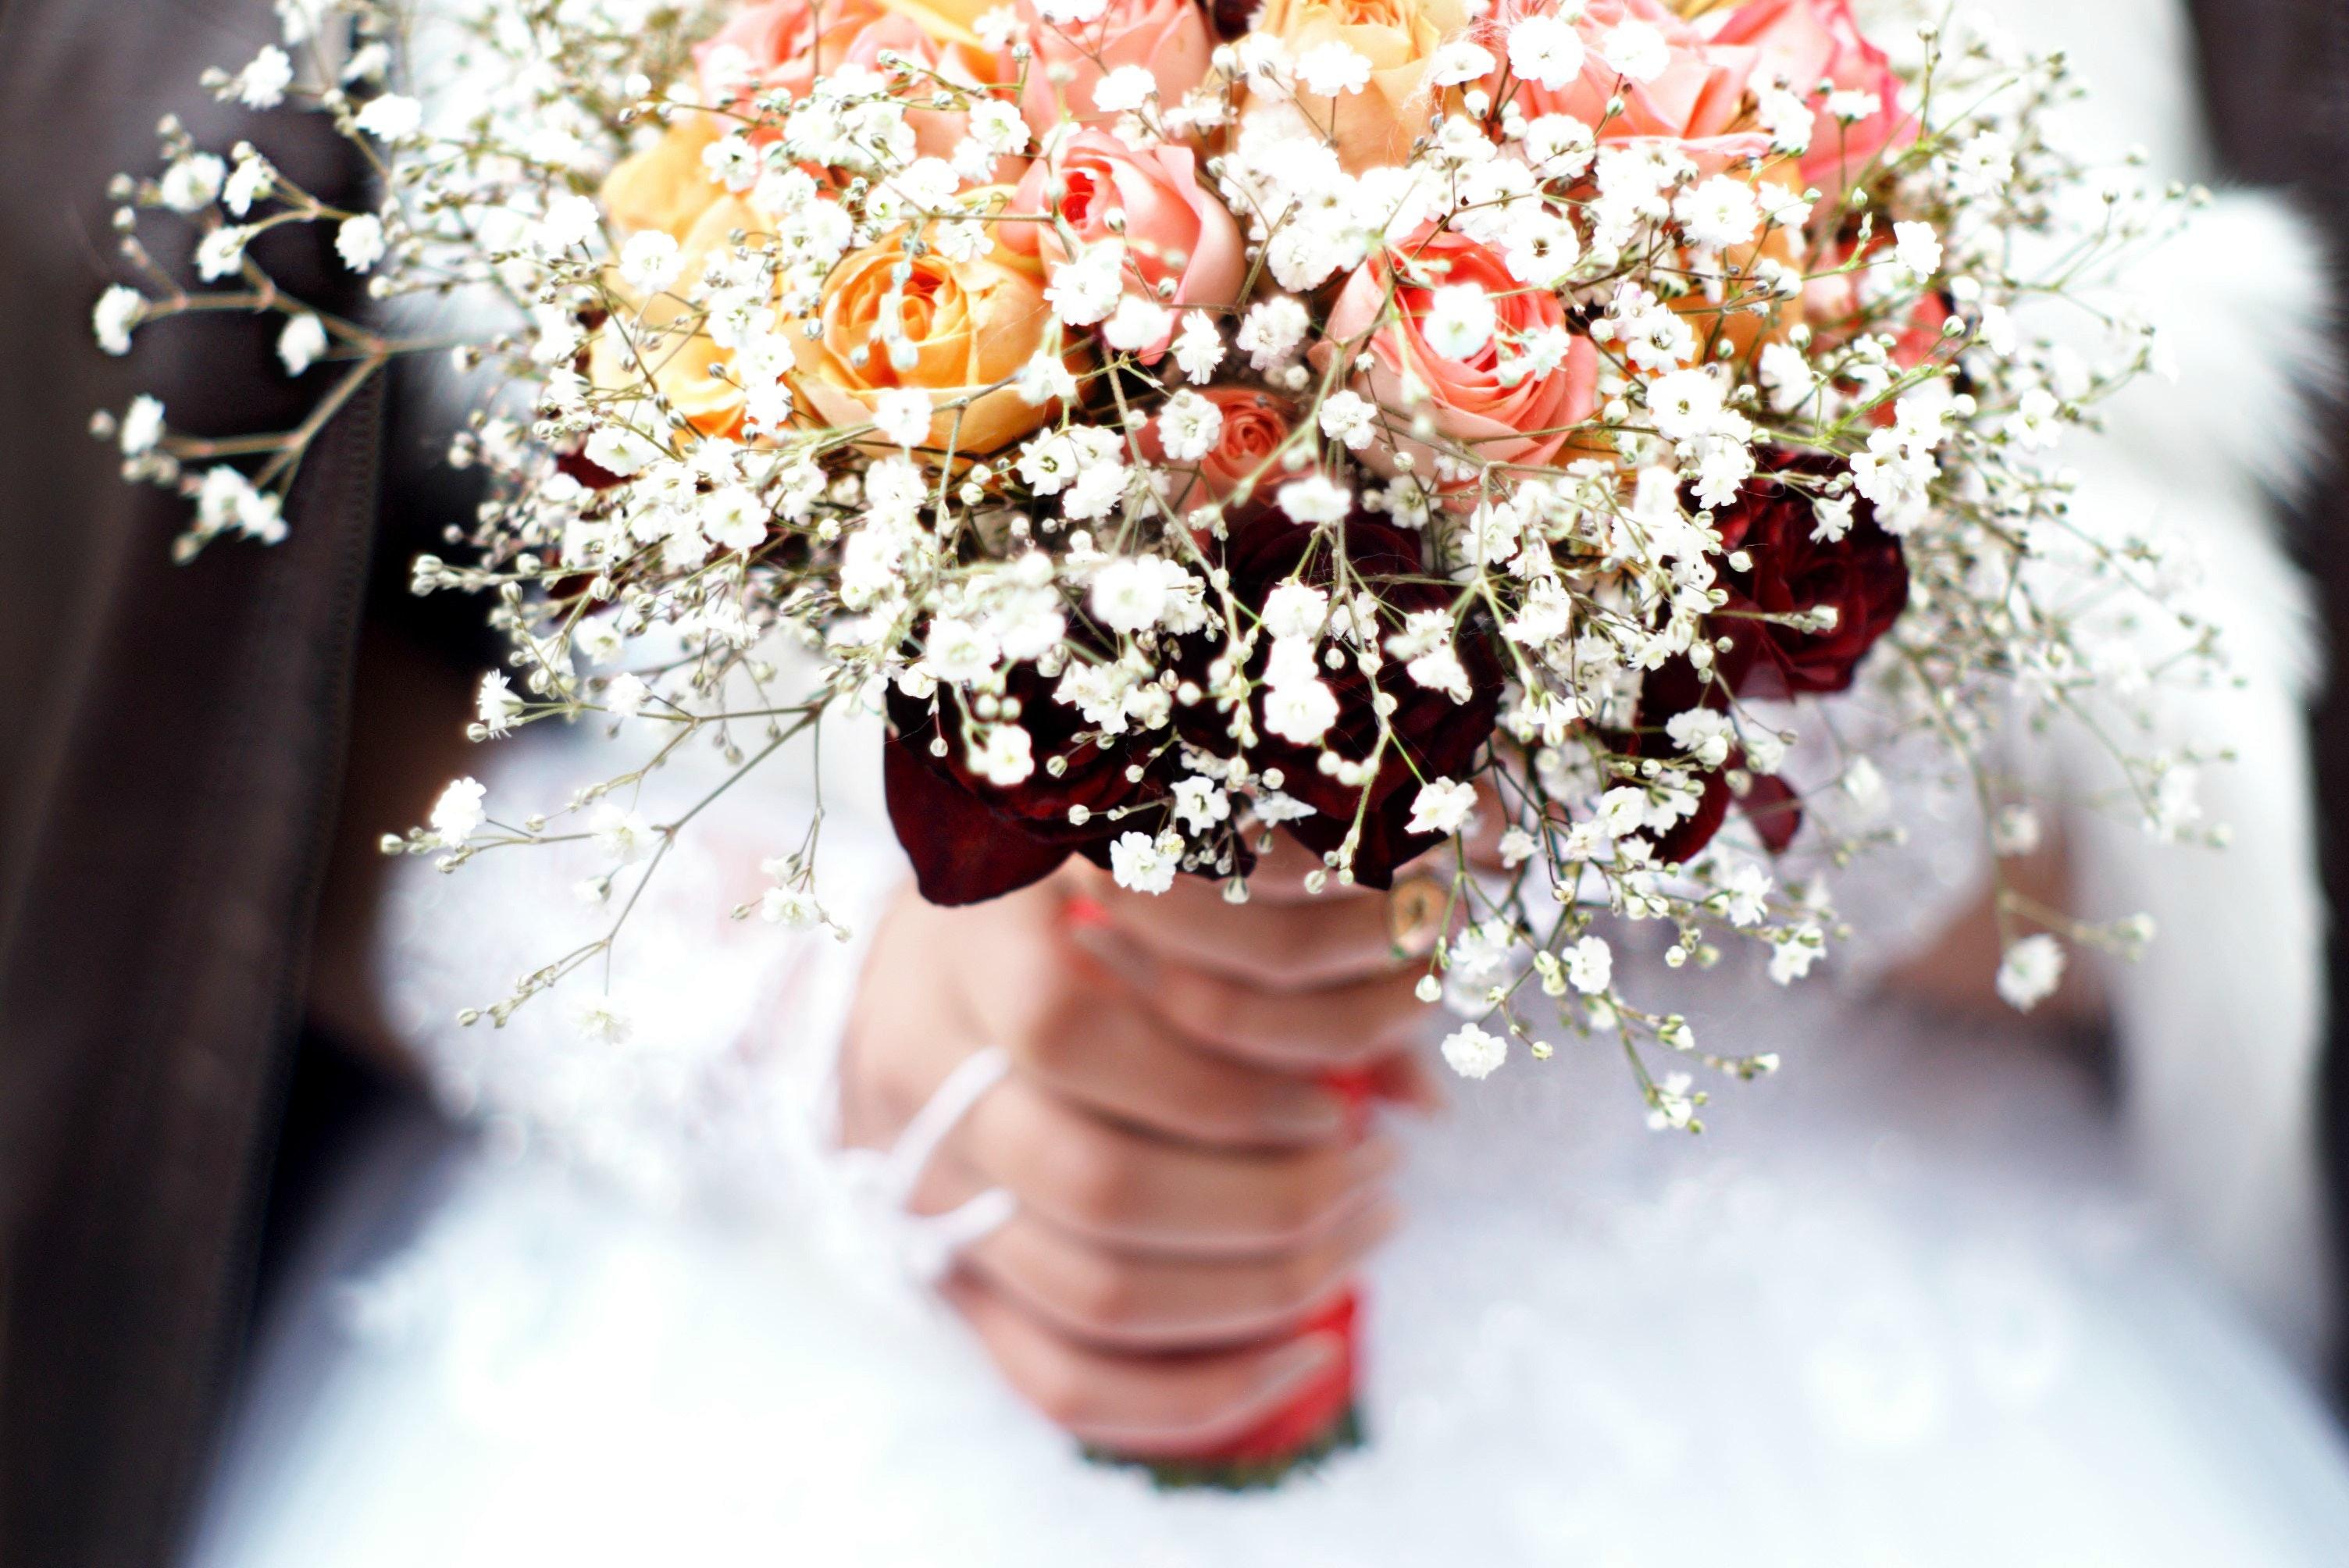 Person Holding Bouquet of Flower, Hands, Groom, Flowers, Flower arrangement, HQ Photo